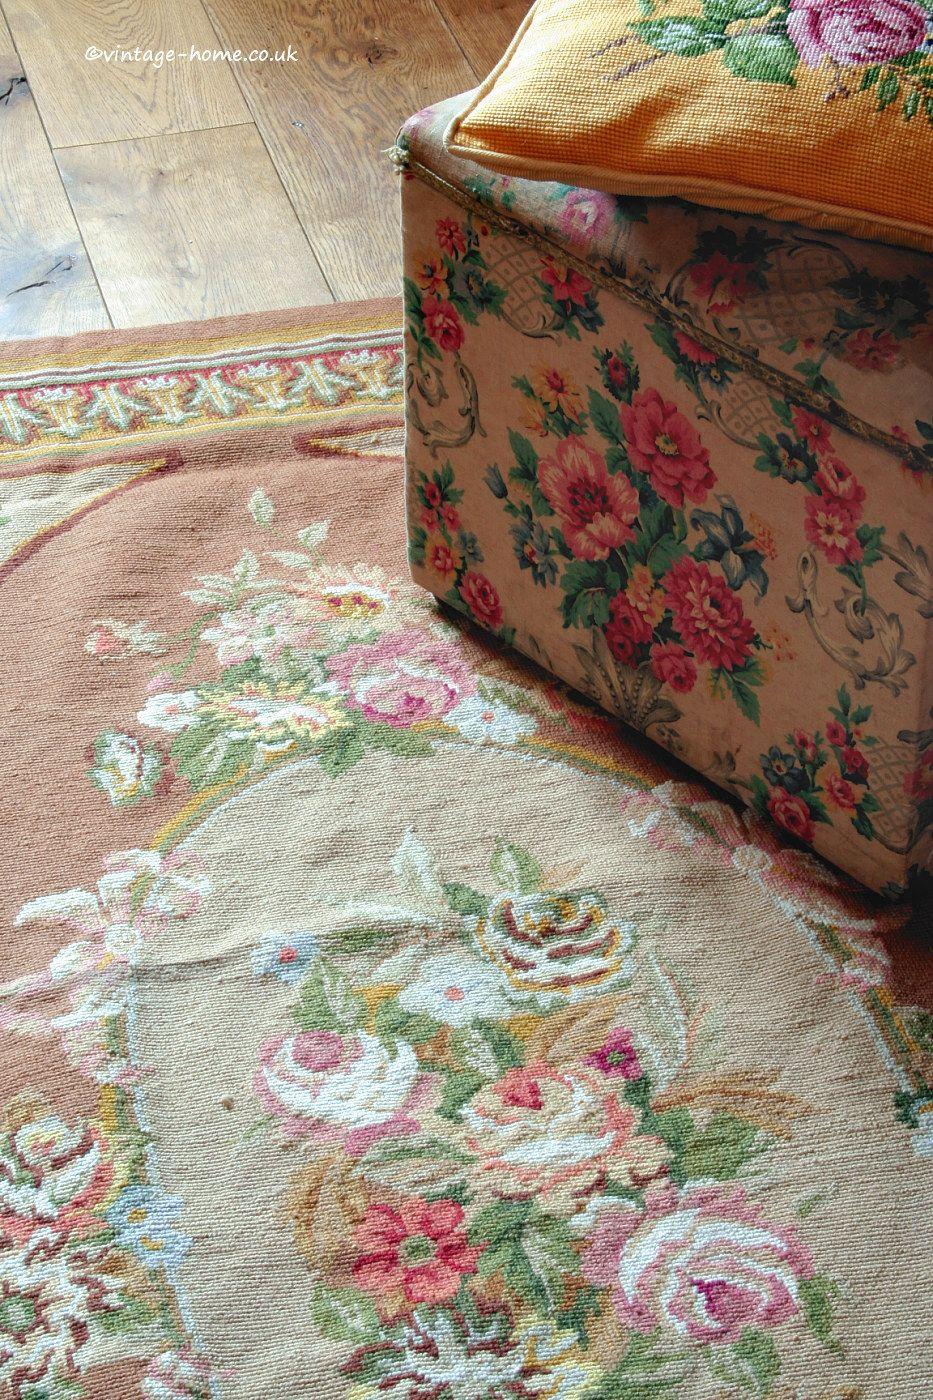 Miraculous Textures Vintage Needlepoint Rug And Cushion On An Oak Home Interior And Landscaping Fragforummapetitesourisinfo